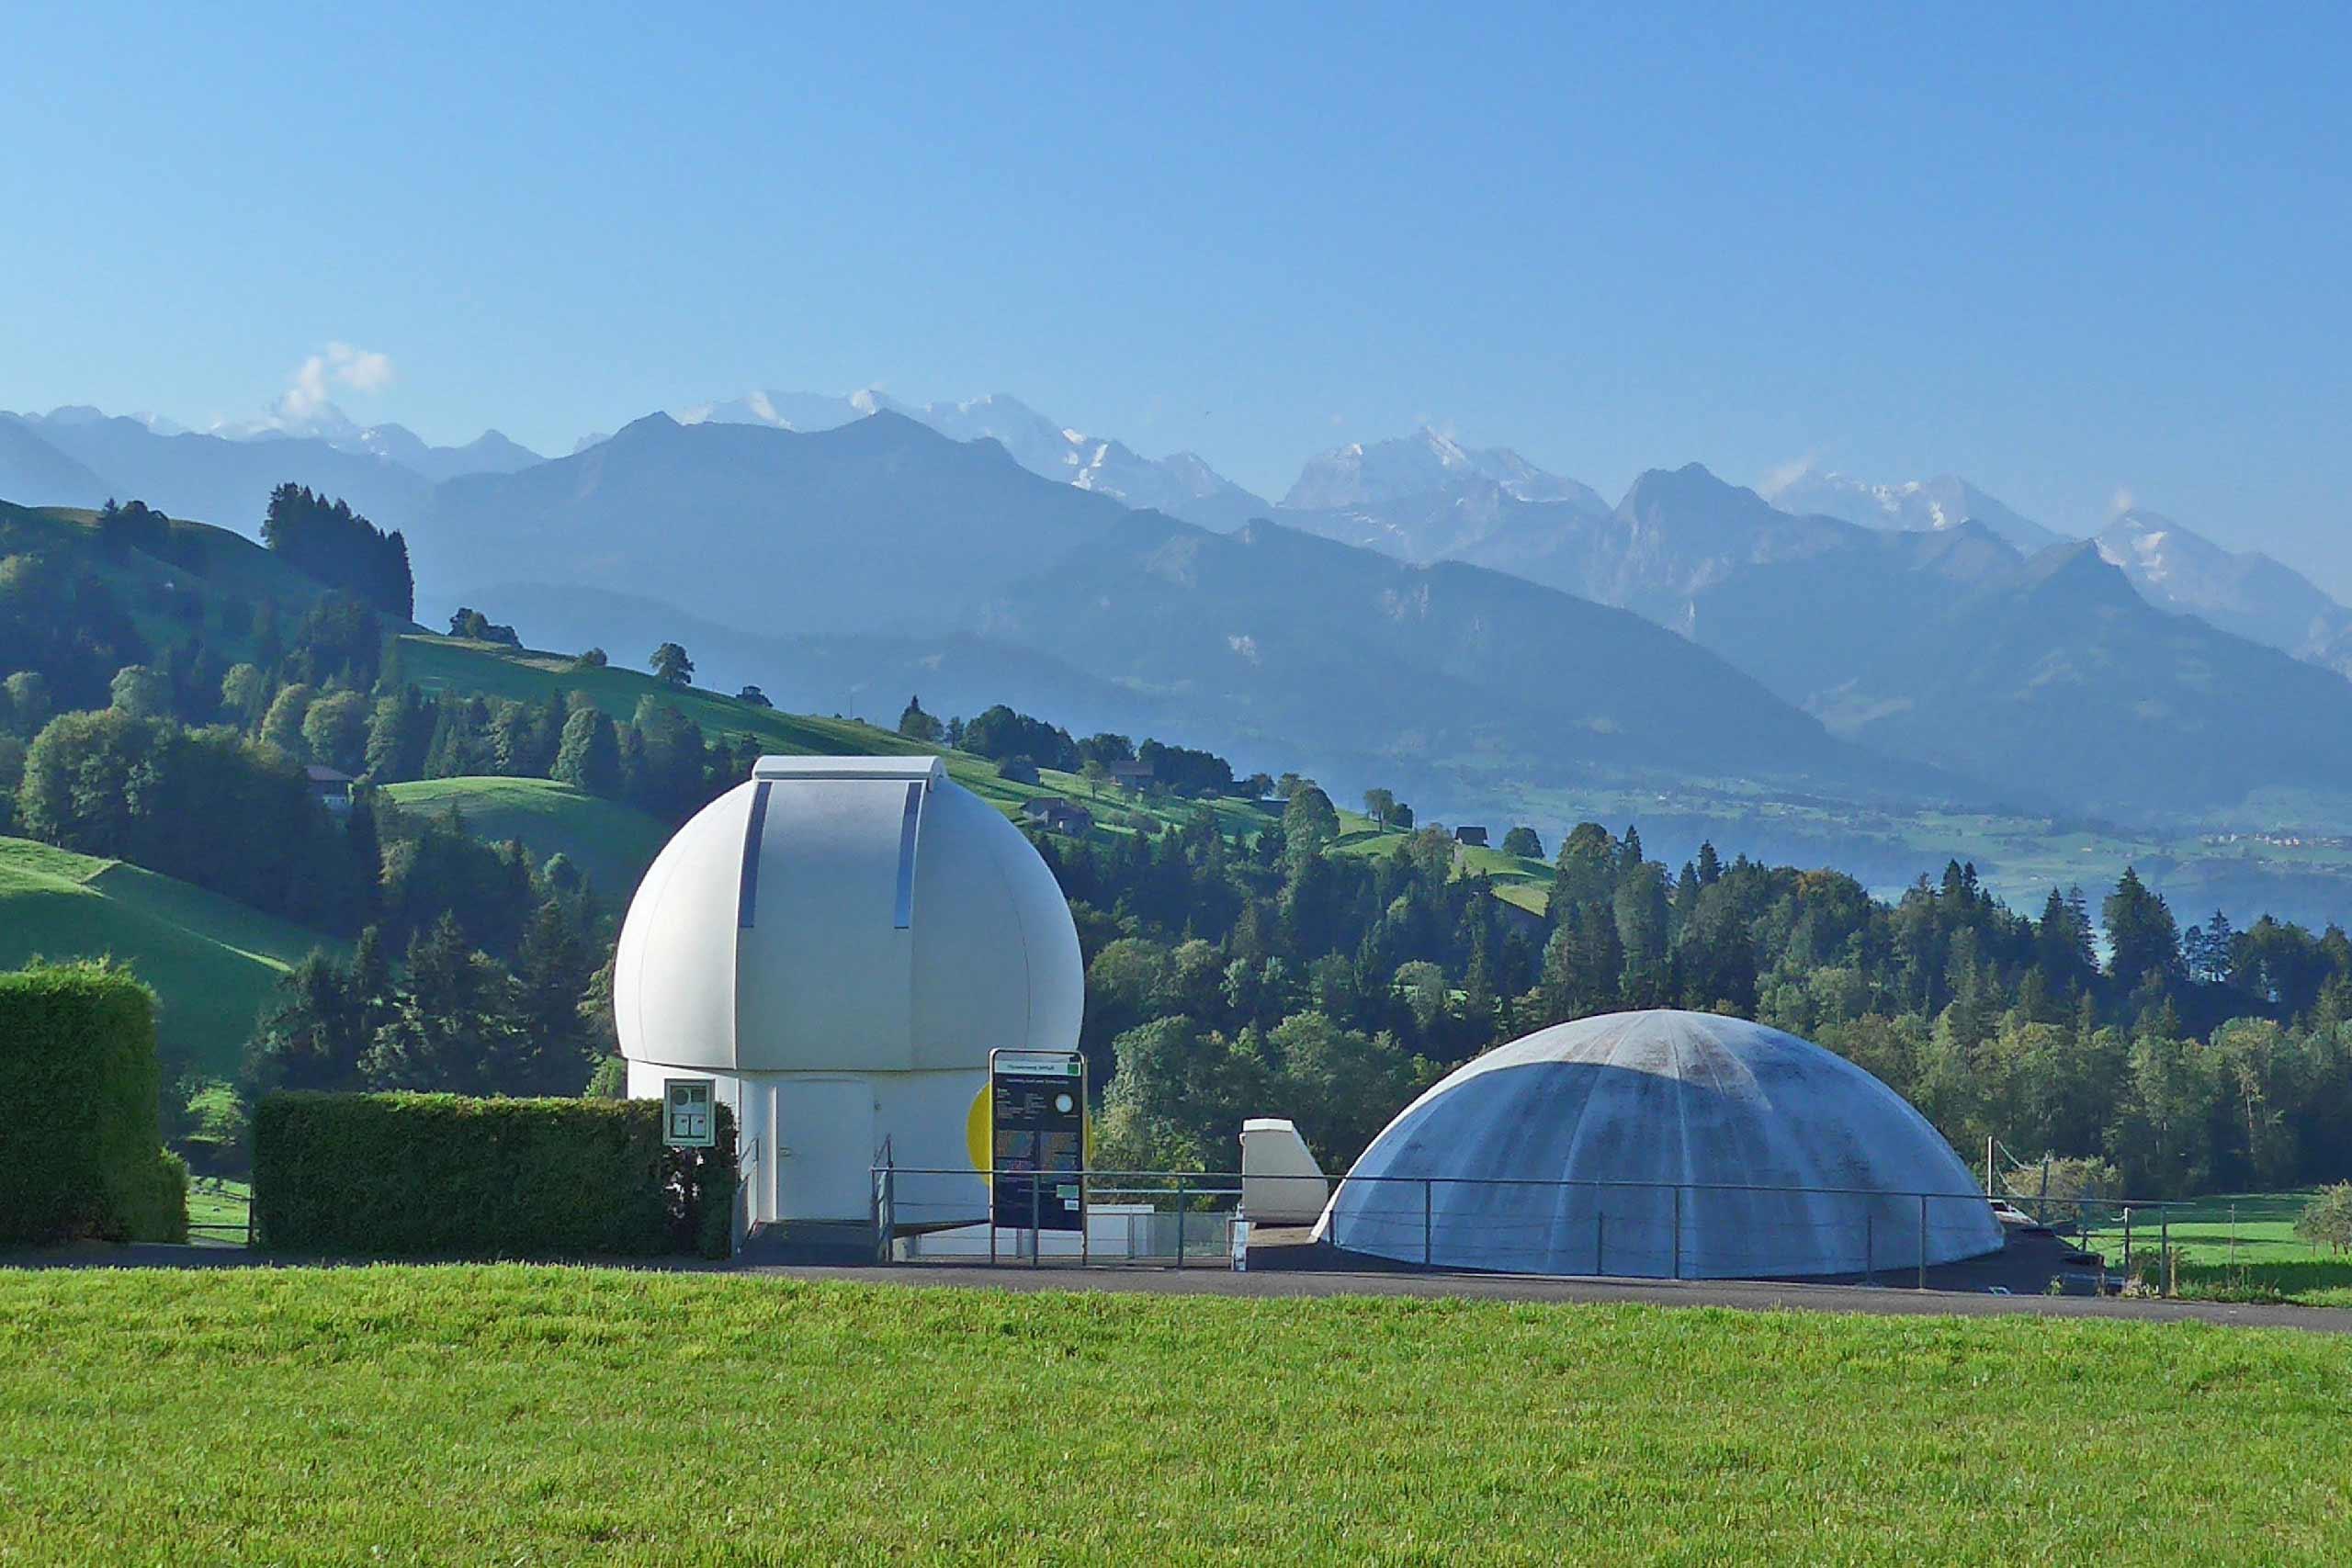 sternwarte-planetarium-sirius-anlage-sommer-sigriswil